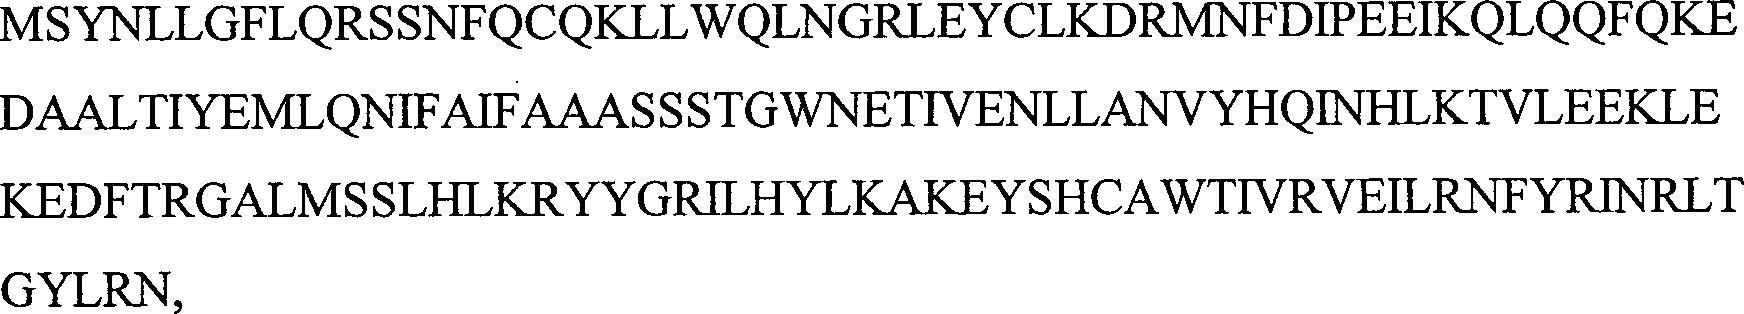 Figure 00690006